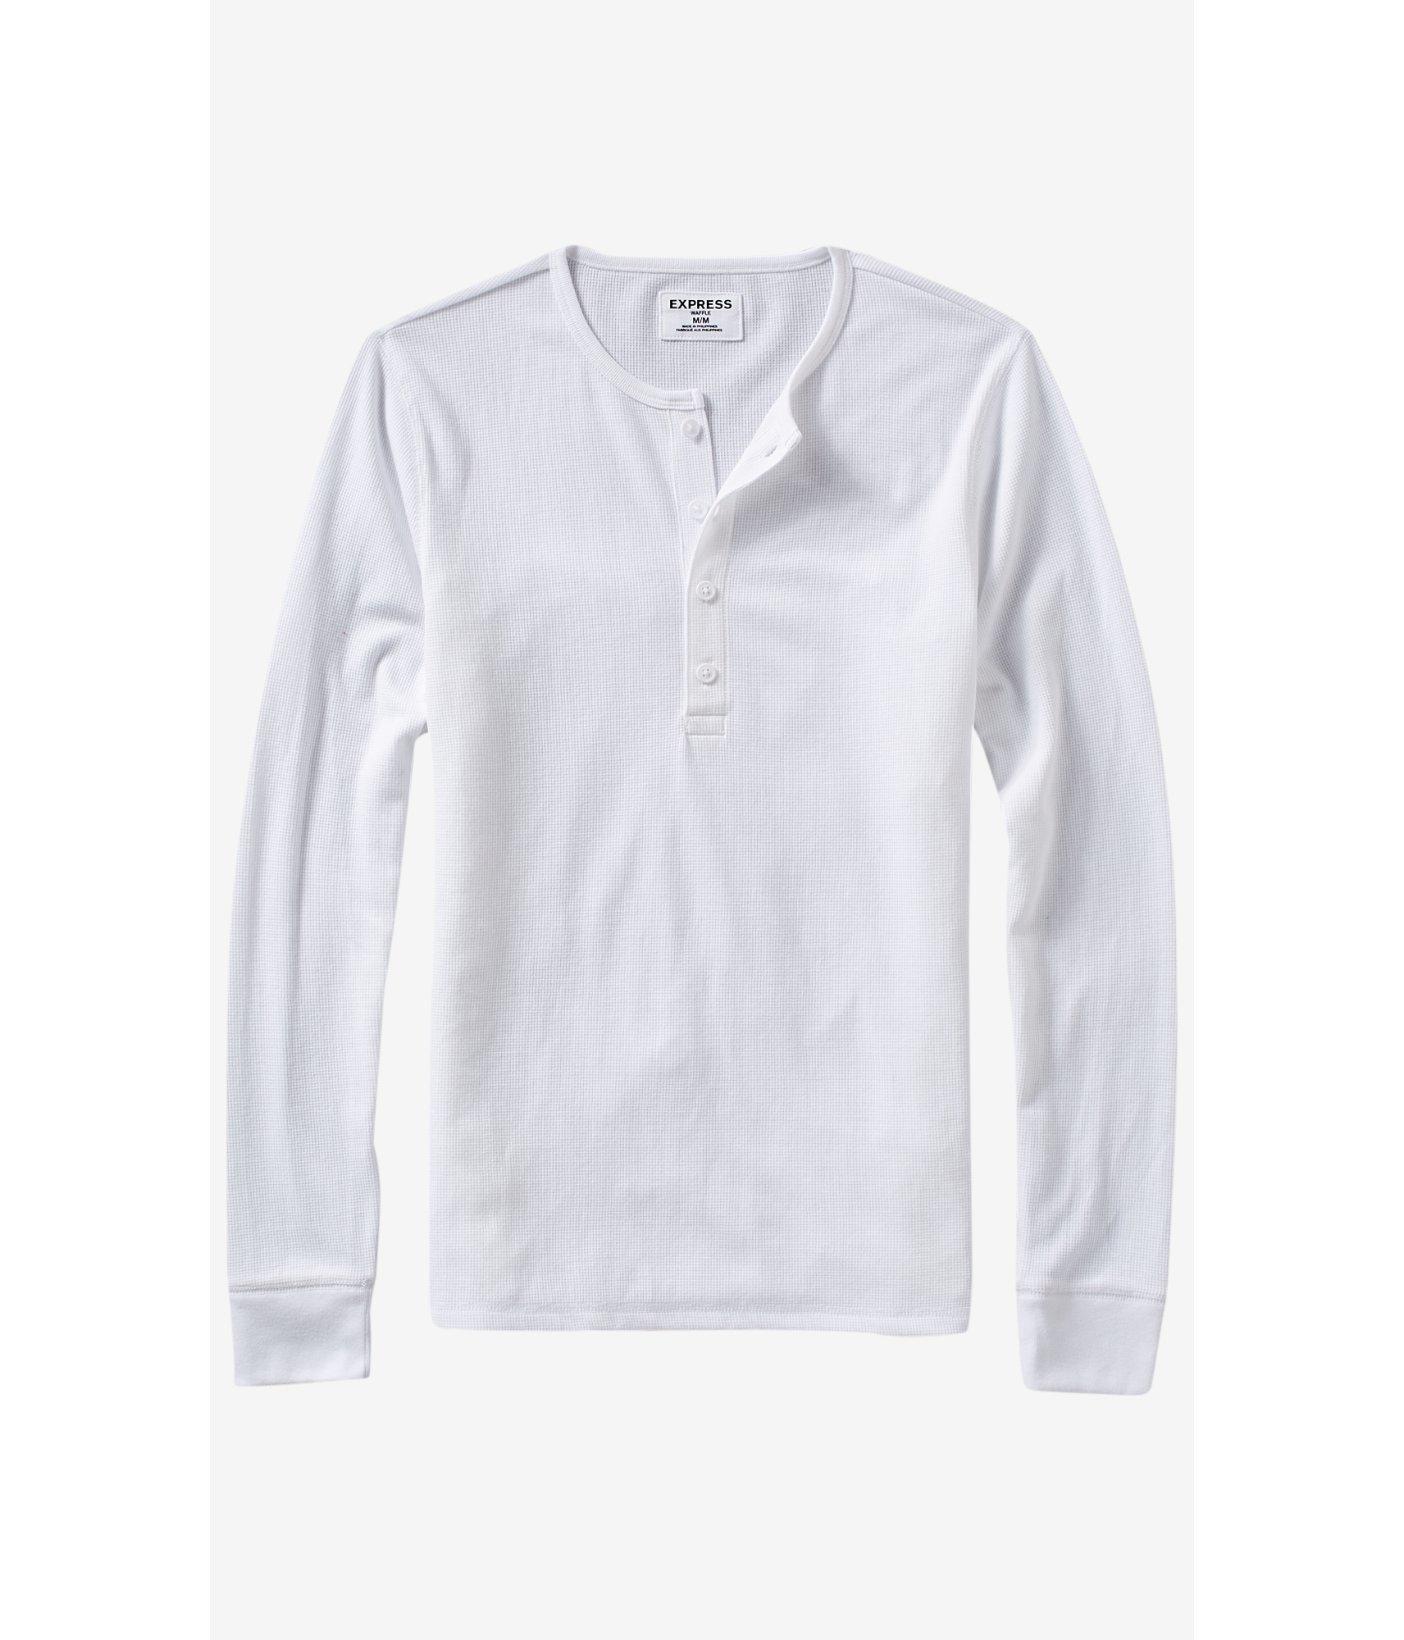 Black t shirt express - Black T Shirt Express Gallery Download